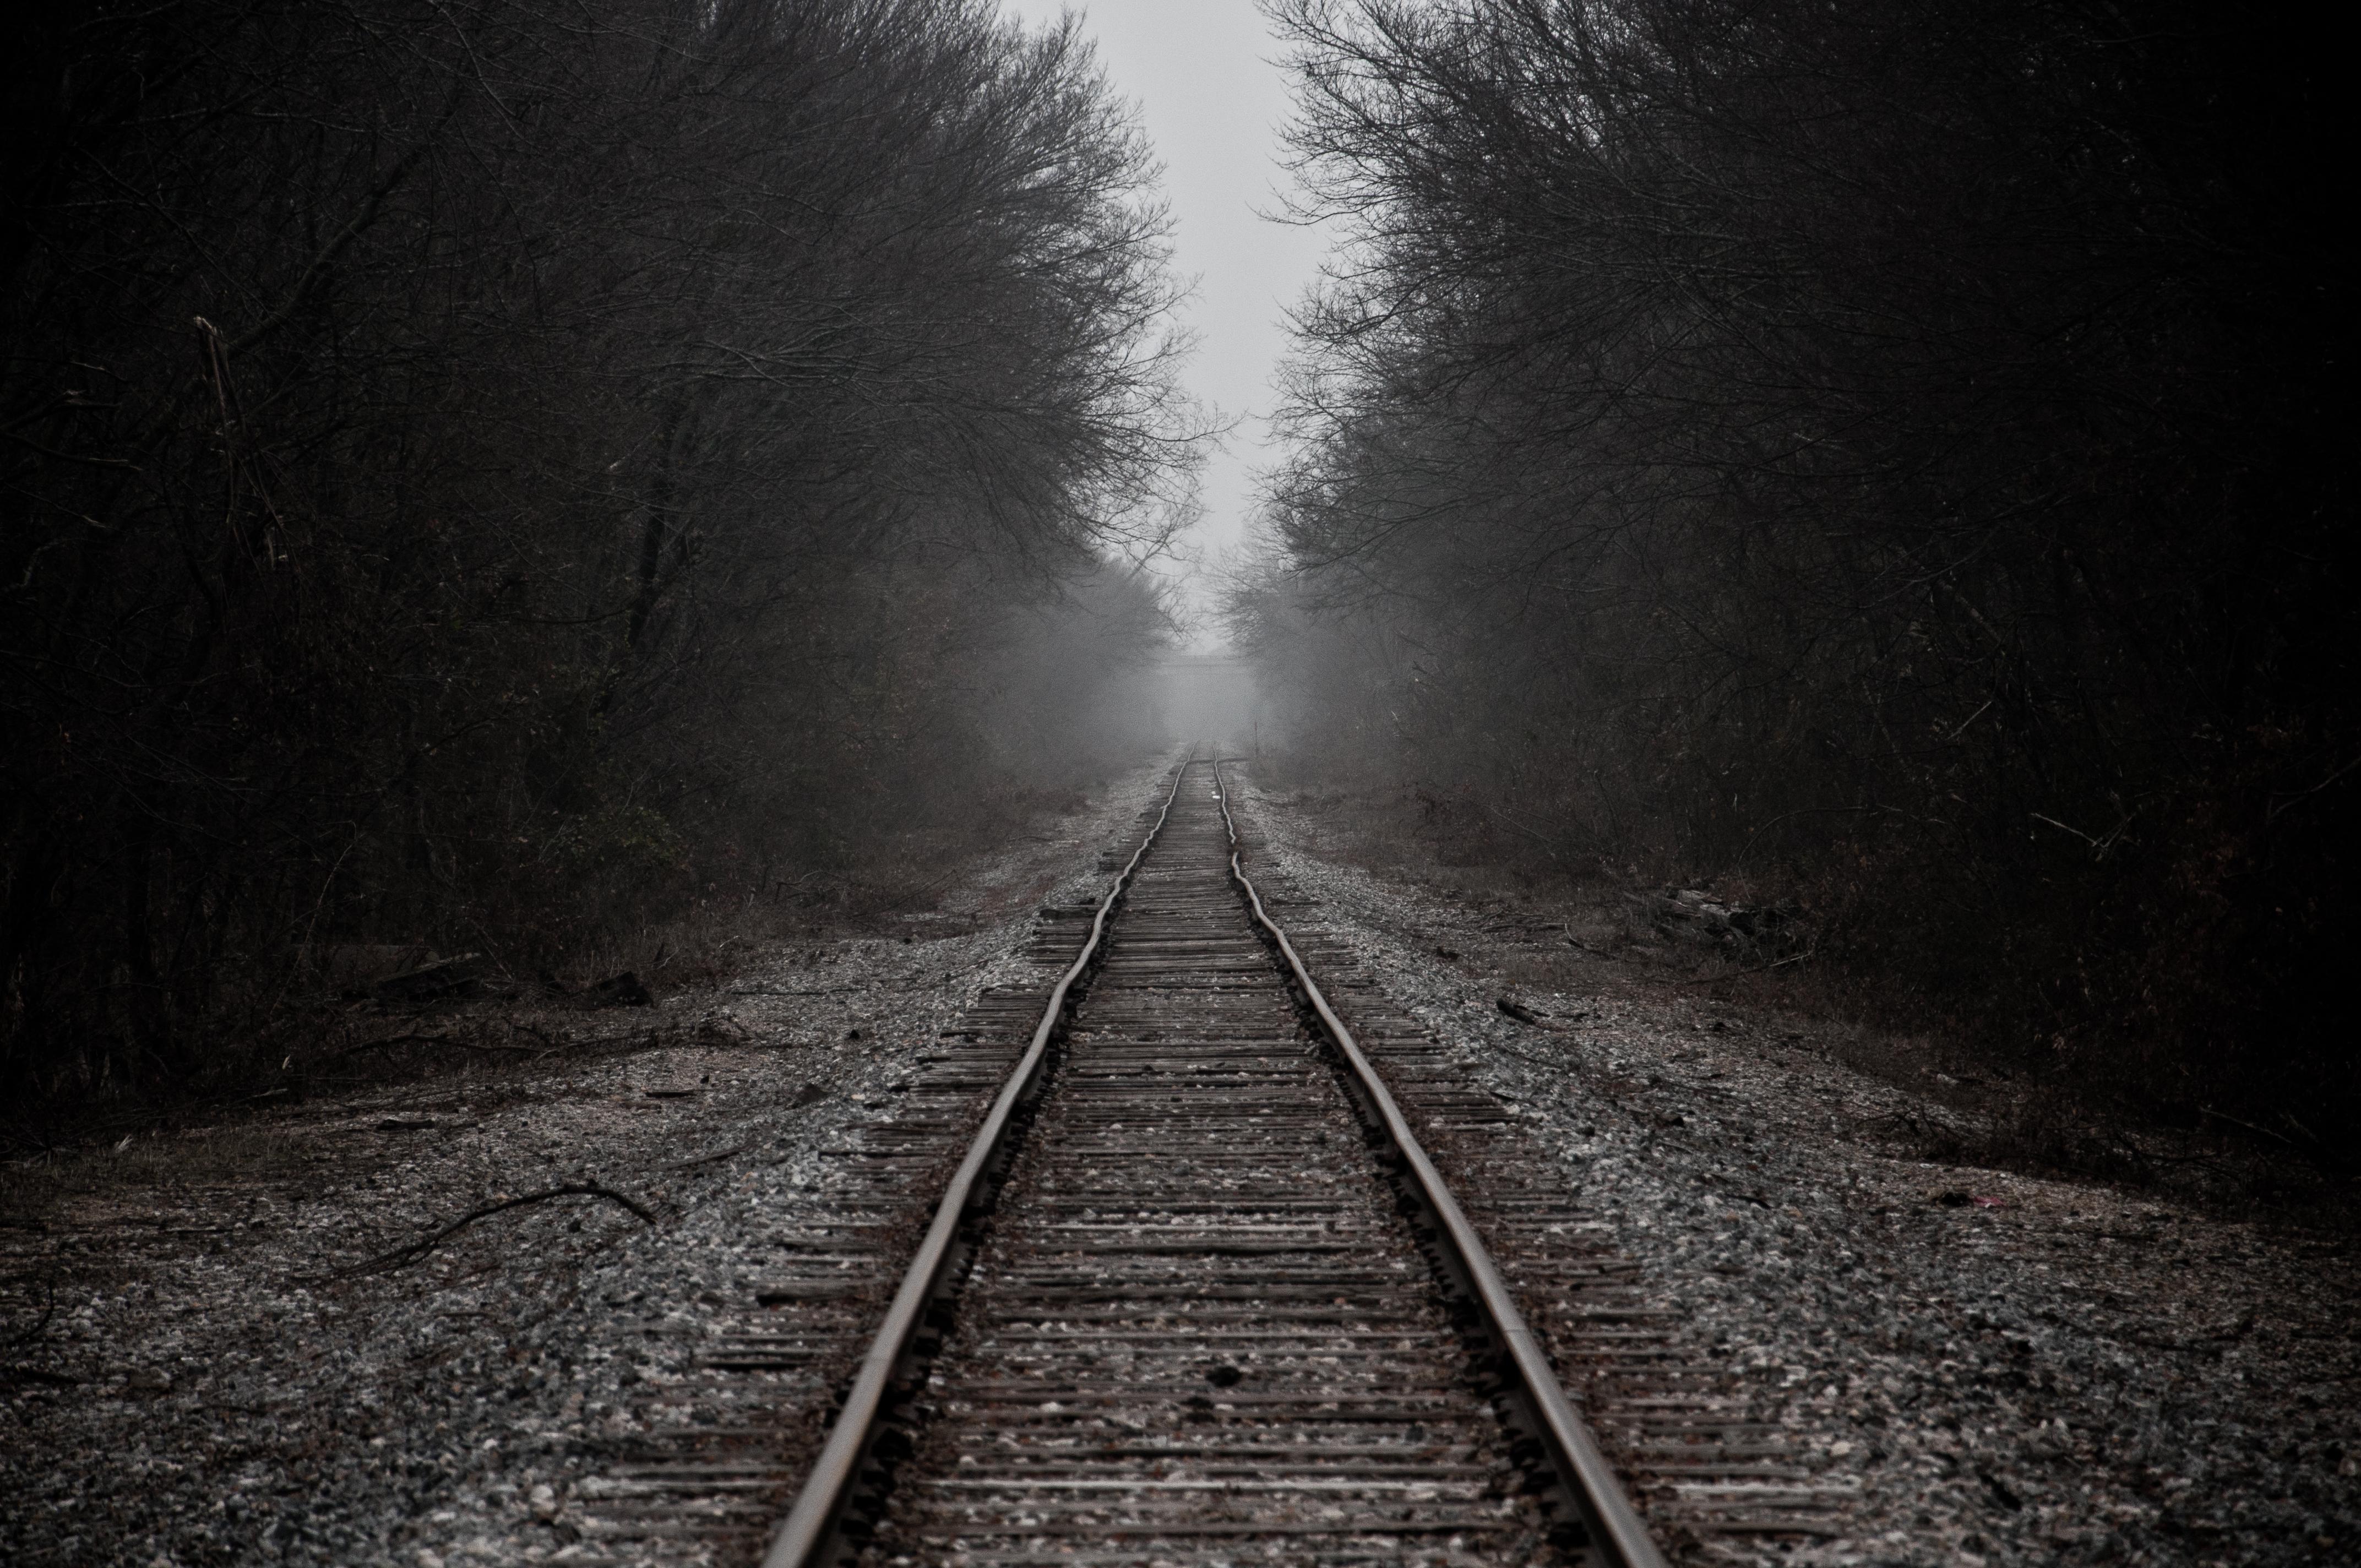 Train Tracks by SeveIV on DeviantArt